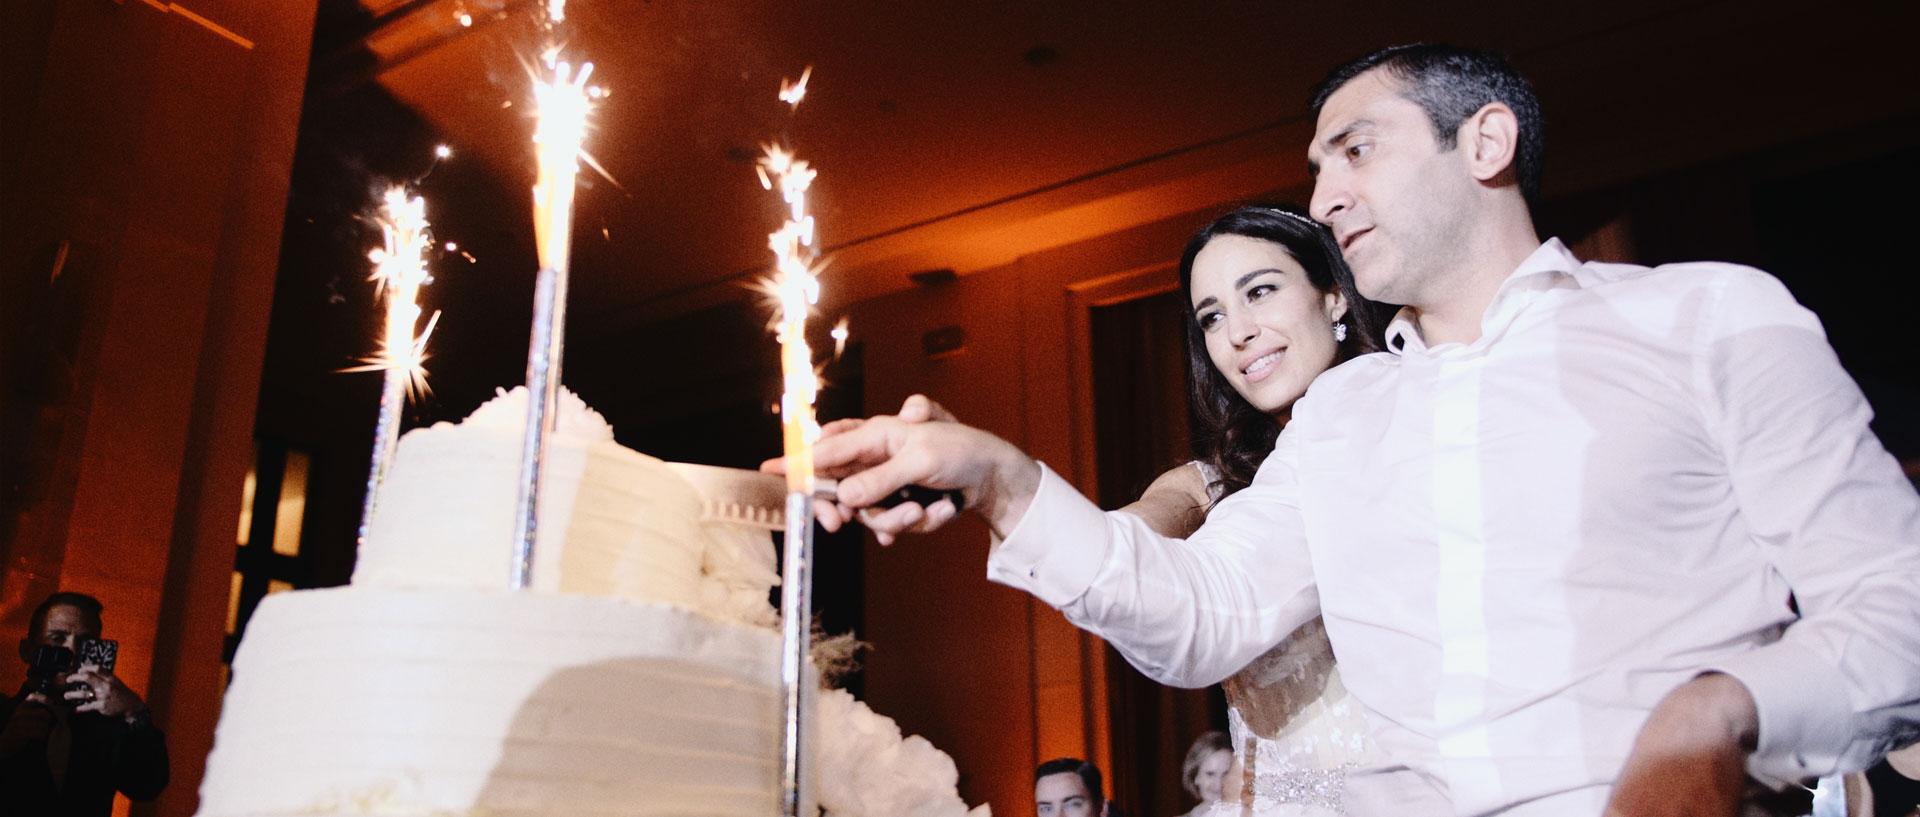 Natasha & Jad Wedding - Casino Biarritz (44).jpg